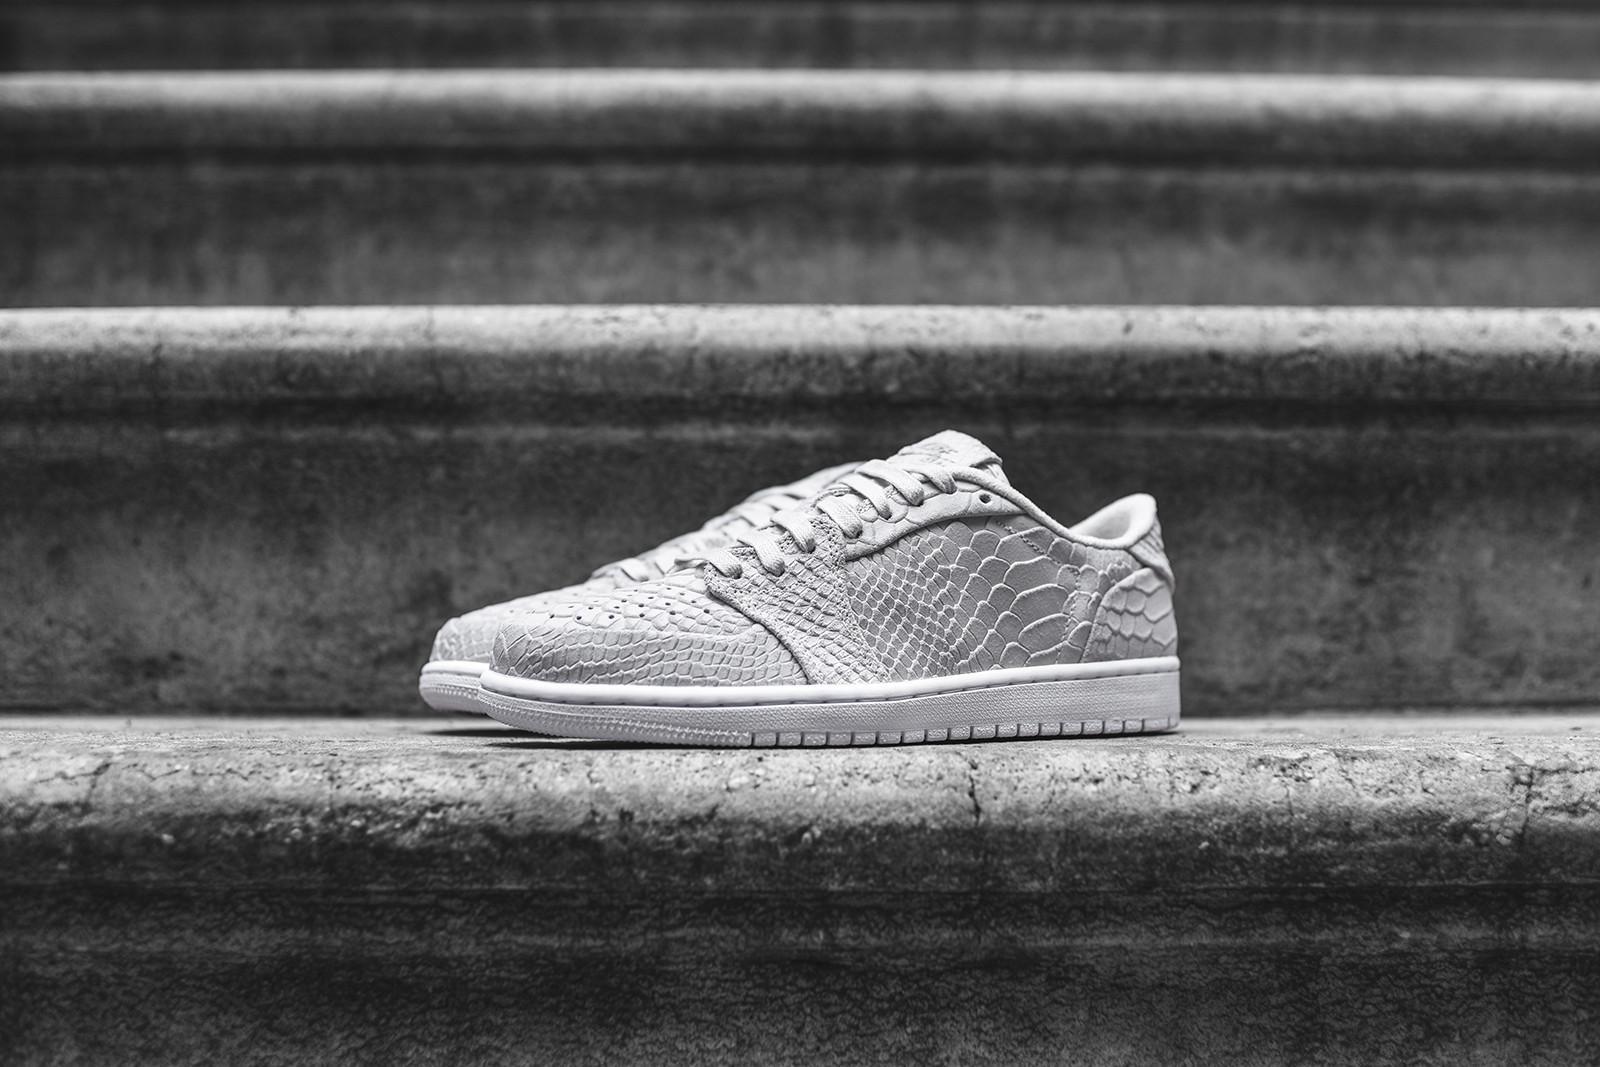 new arrival 115b6 fc793 Jordan Brand   Kicks Off Court   Release Reminder   Retro Lifestyle ...